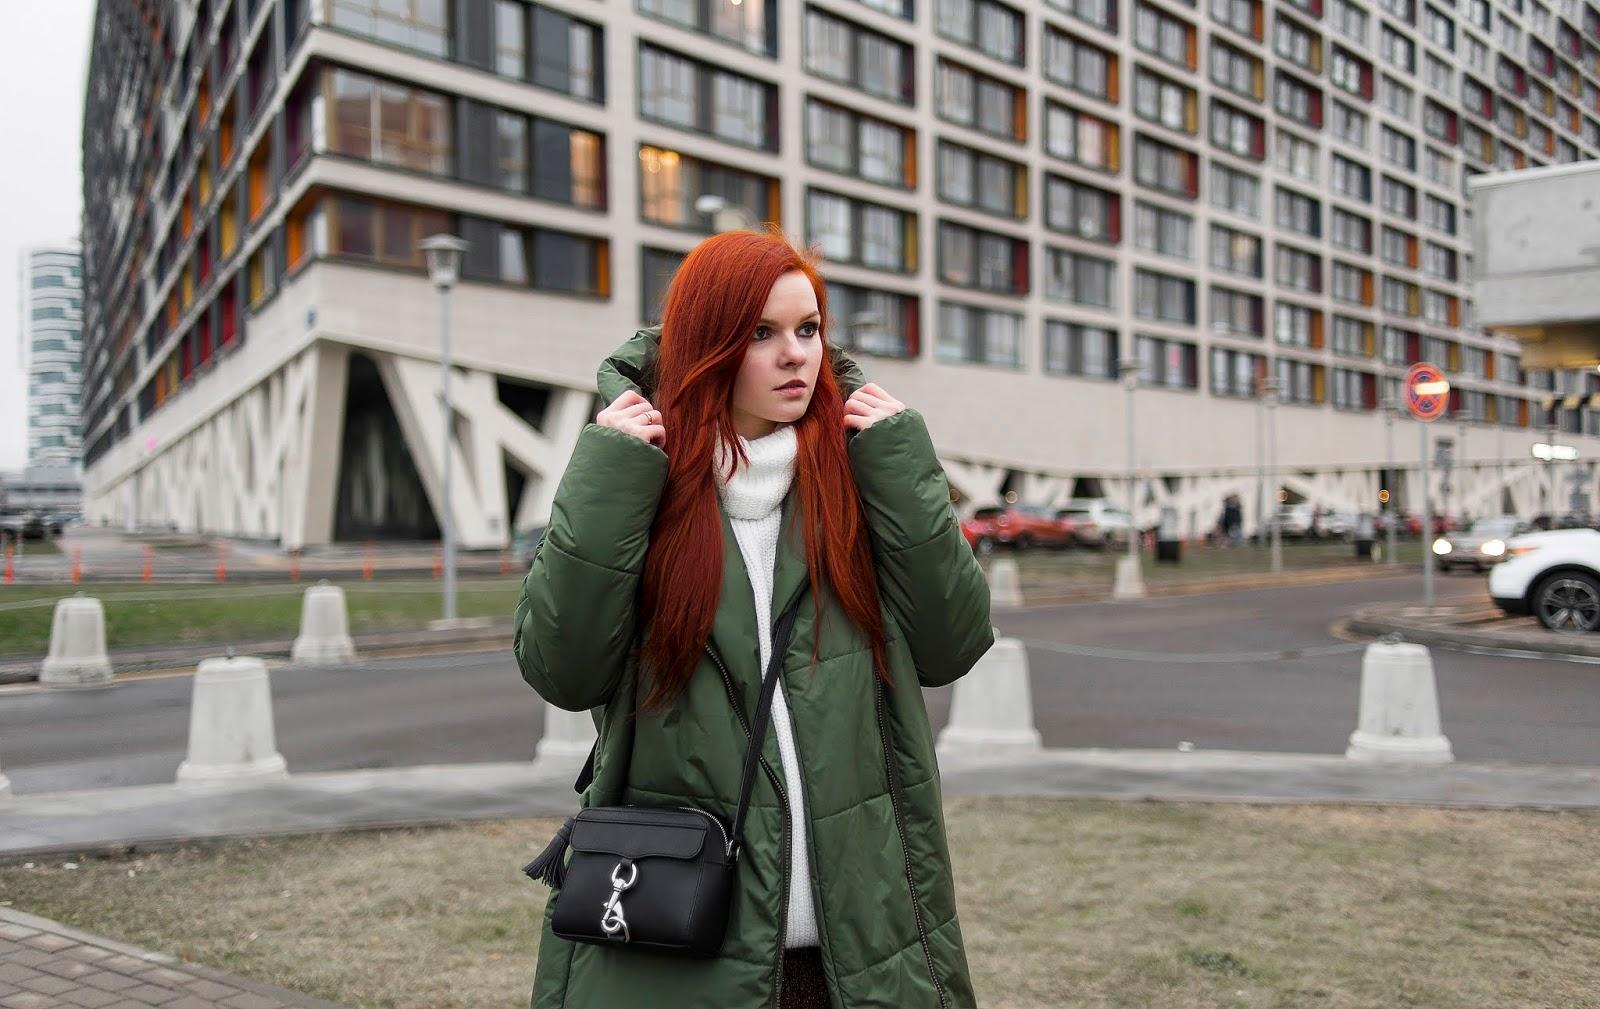 http://www.recklessdiary.ru/2019/01/Trends-Brands-gde-kupit-puhovik-odeyalo-rosijskie-modnye-brendy-marki-odezhdy.html